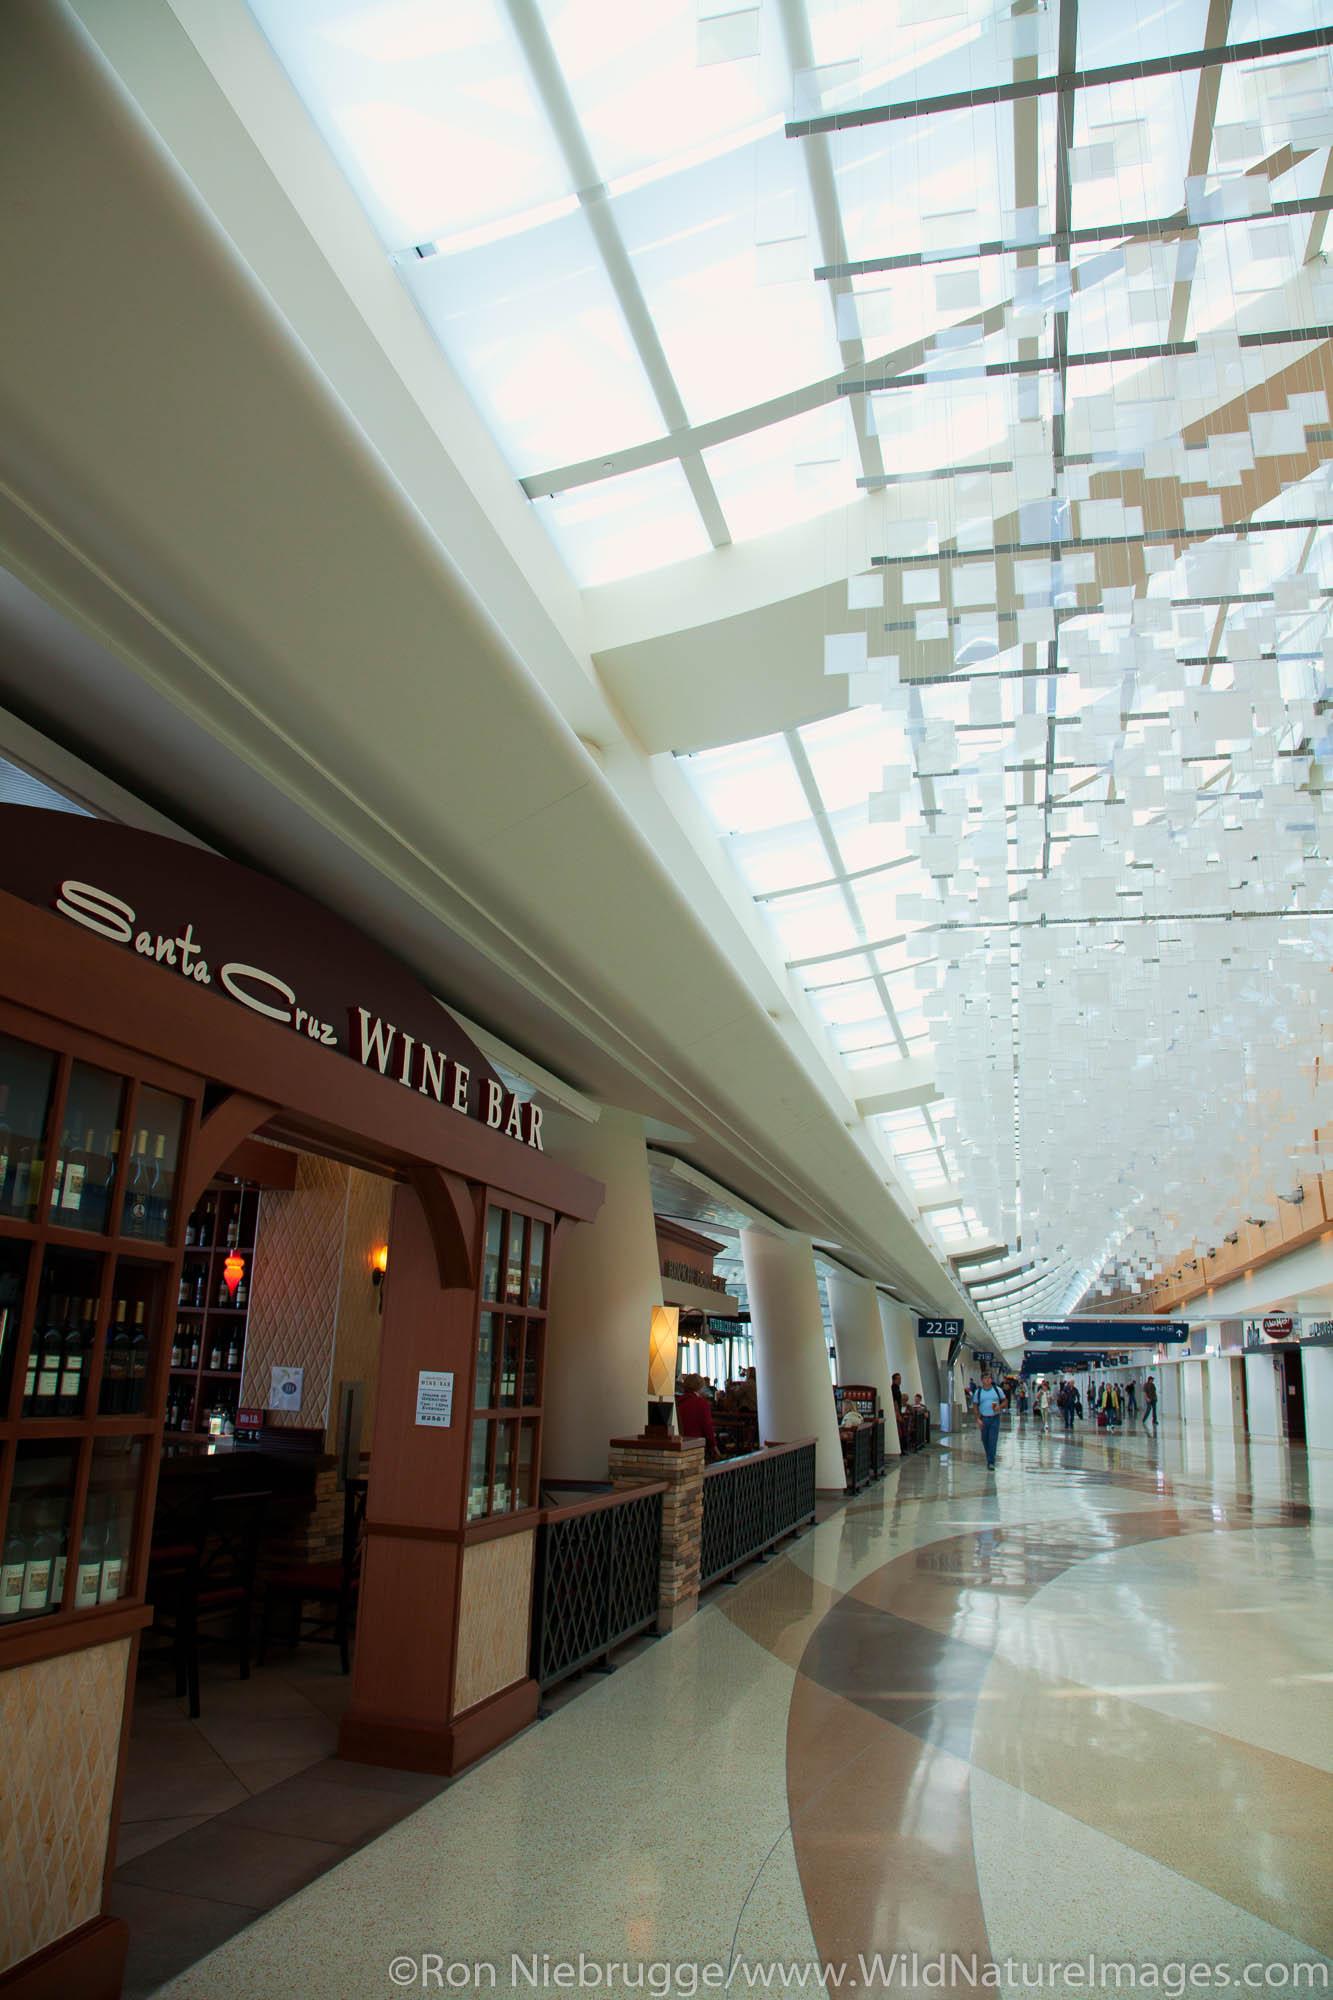 Norman Y. Mineta San Jose International Airport, San Jose, CA